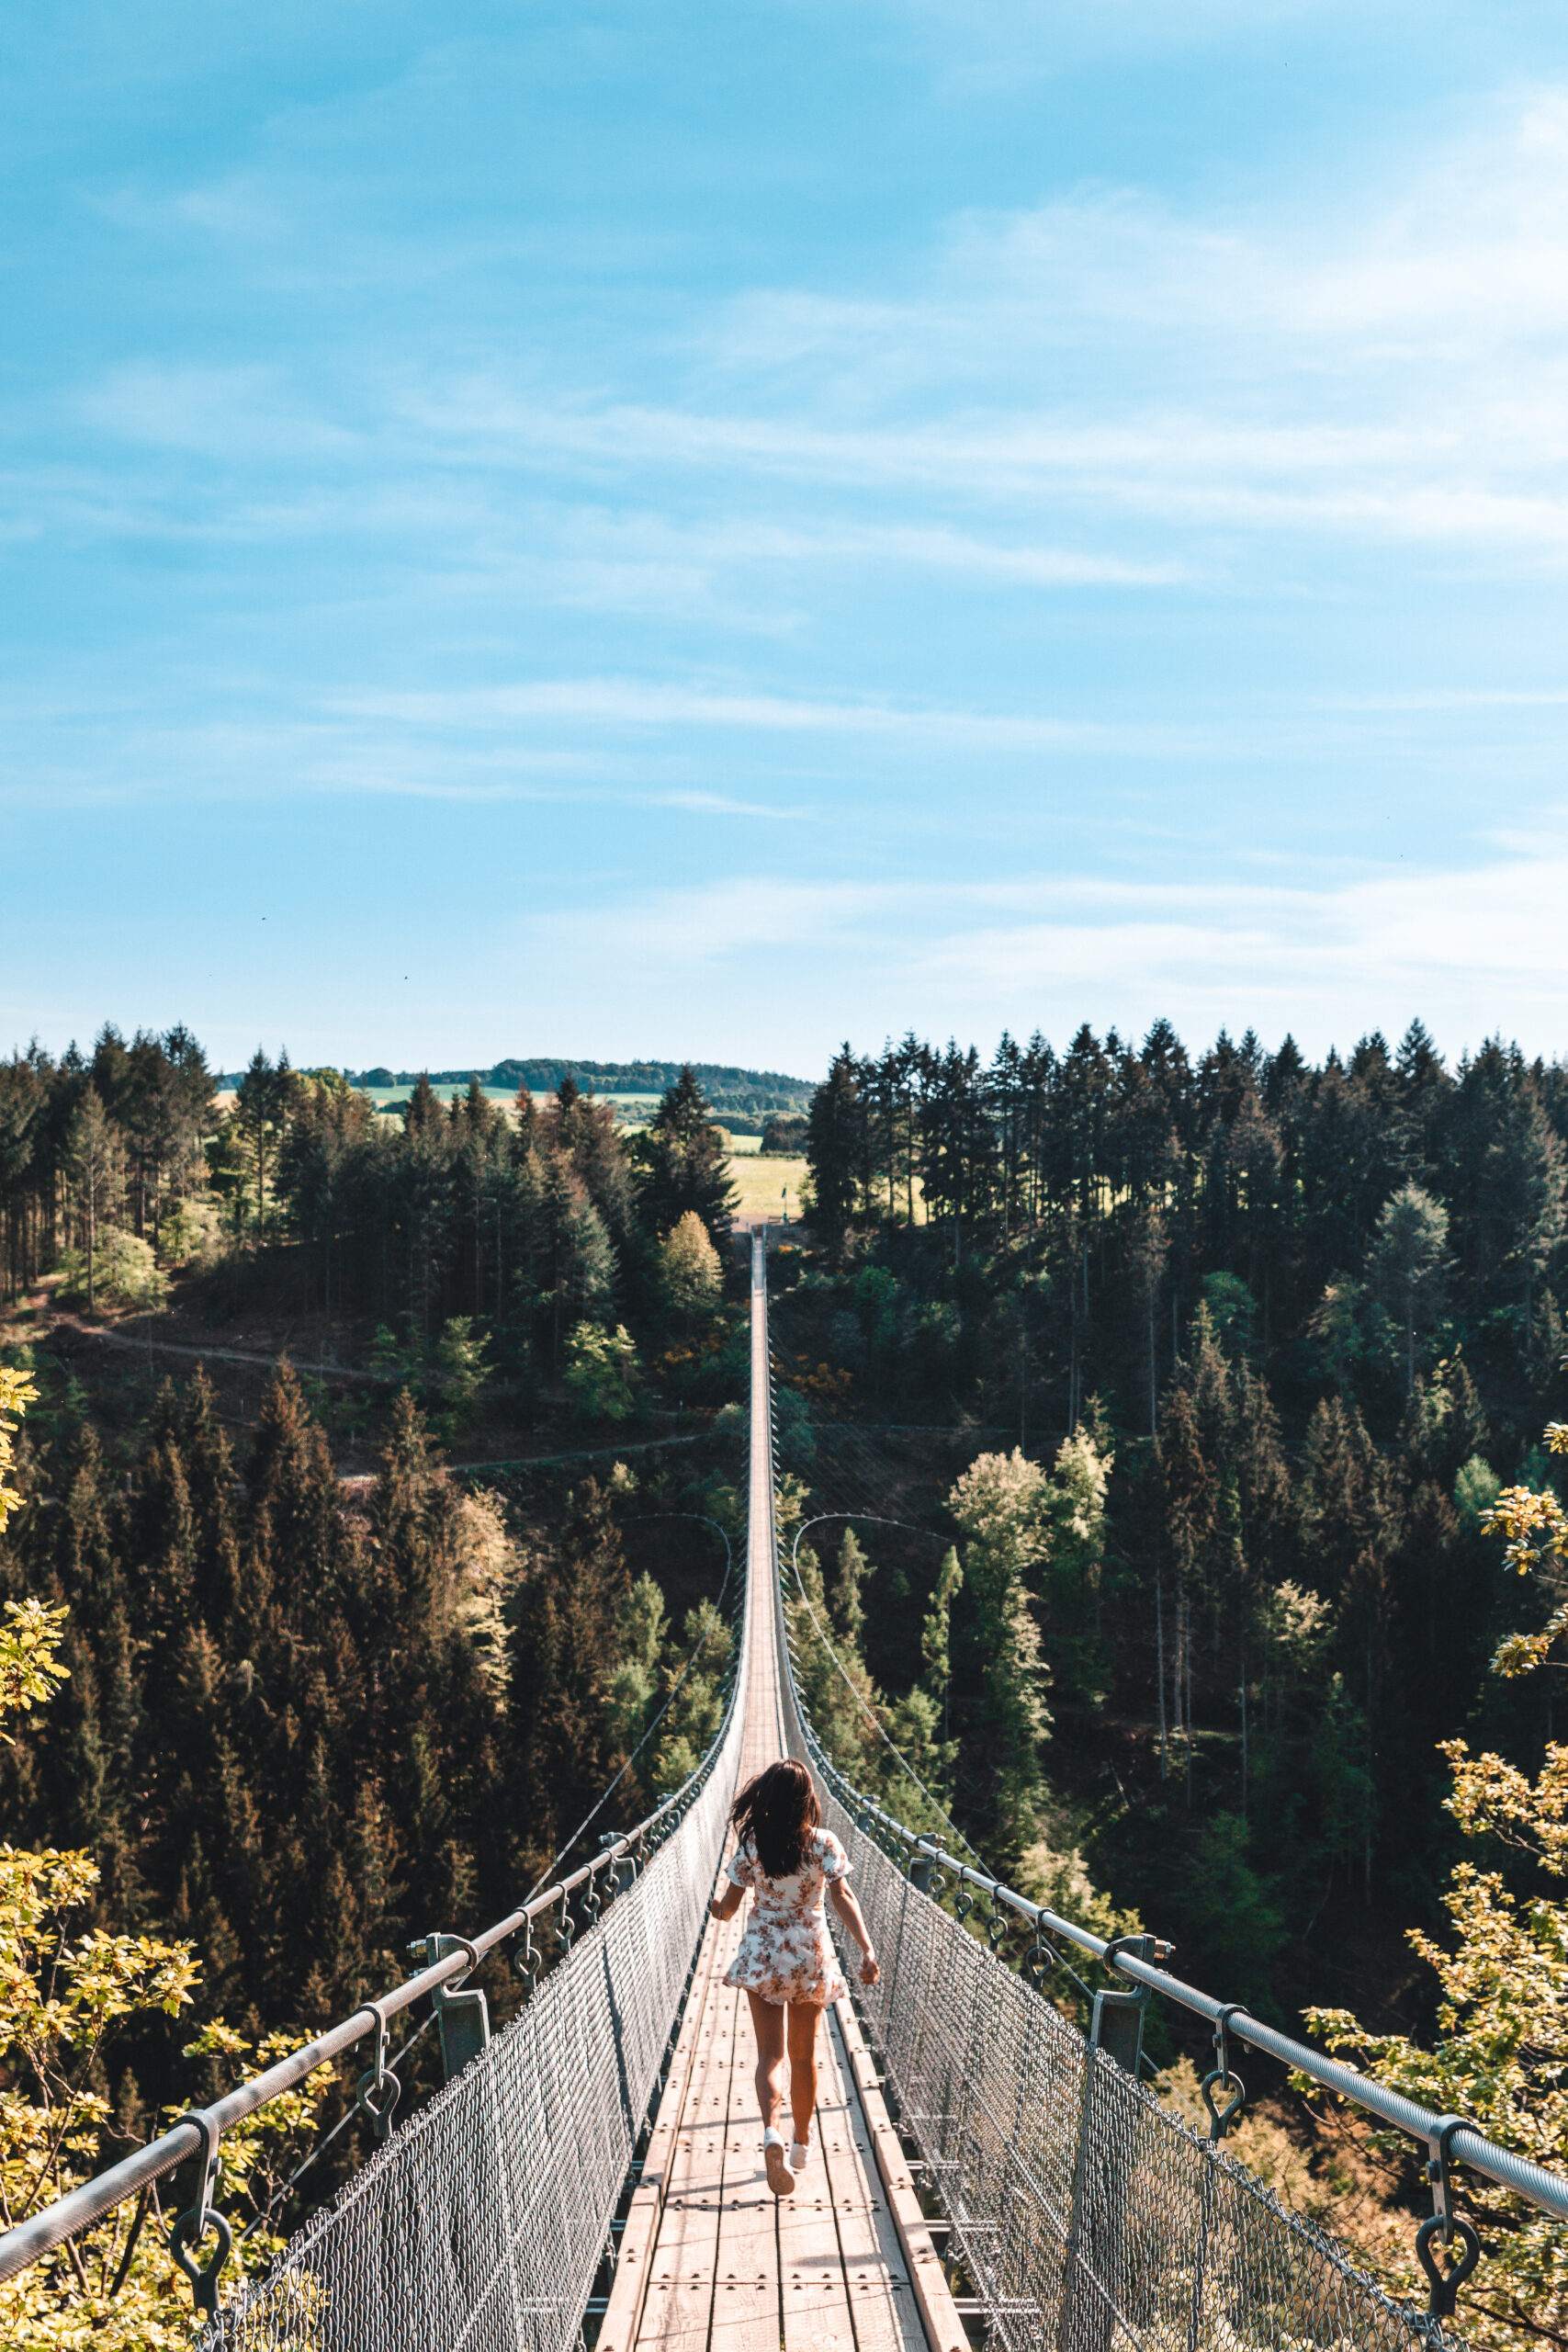 Geierlay Rope Bridge |Germany's Most Beautiful Bridge